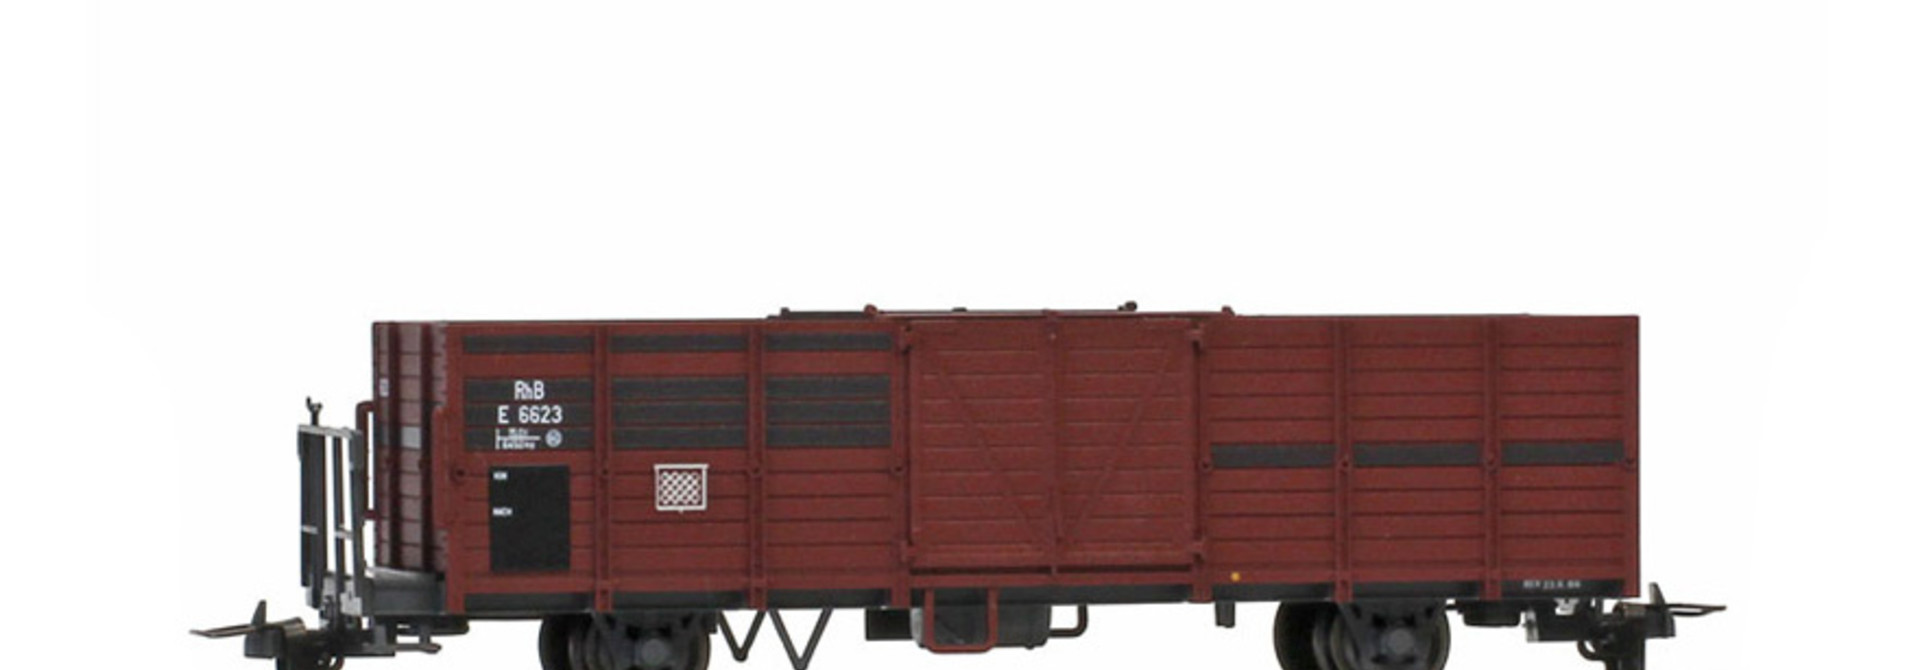 2251113 RhB E 6623 Hochbordwagen (Bretter ausgebessert)